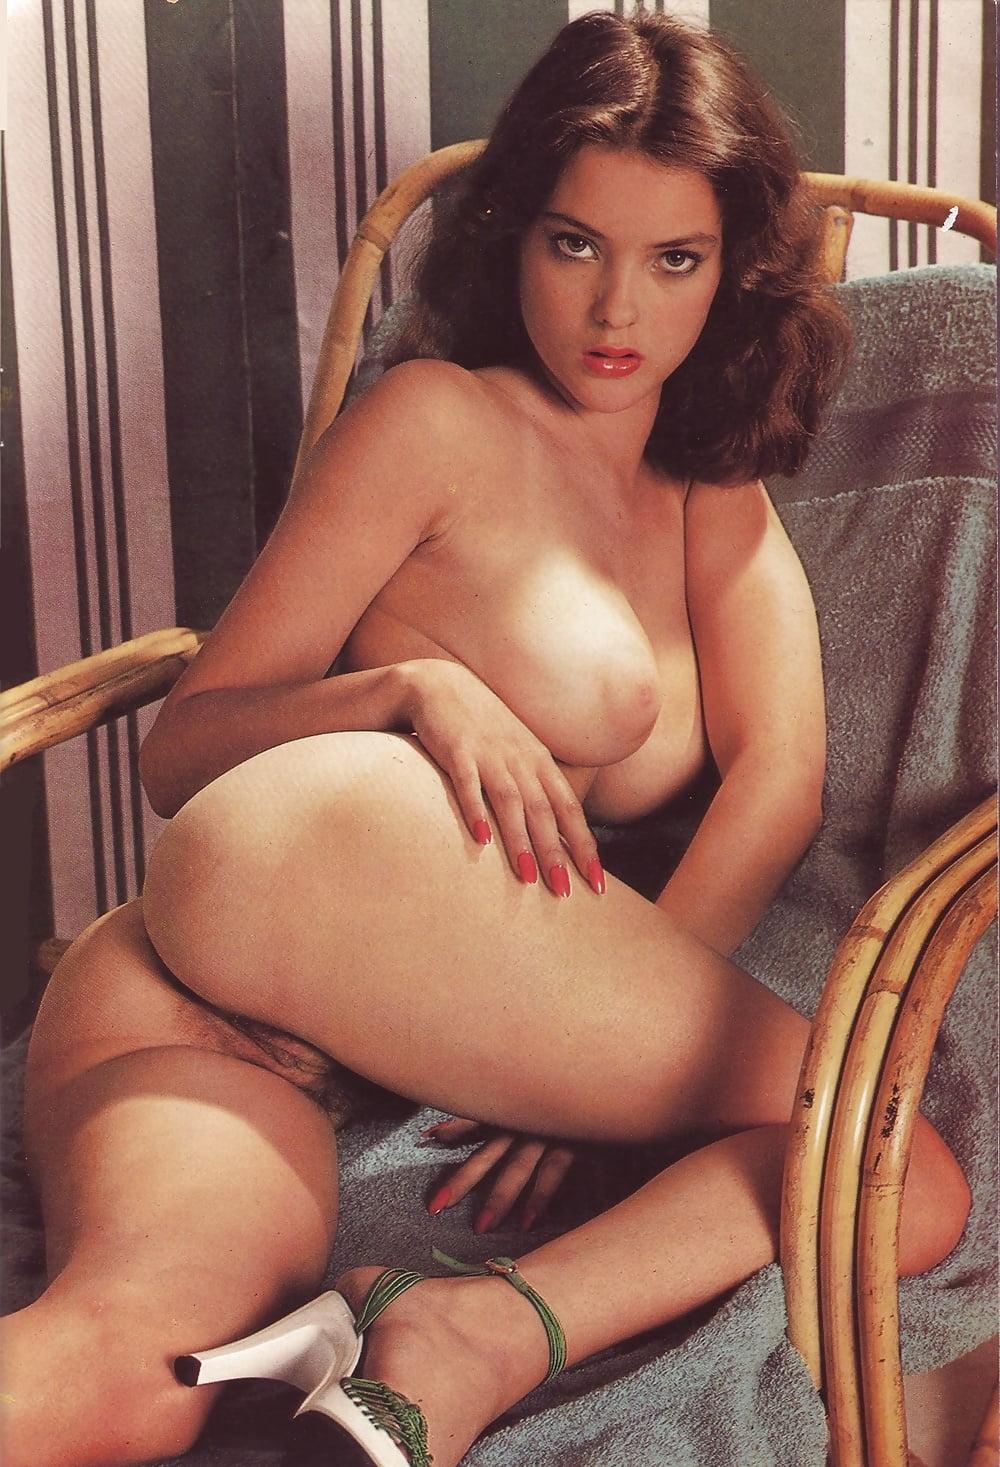 Porn classic porn star porn star keisha porn star keisha classic porn